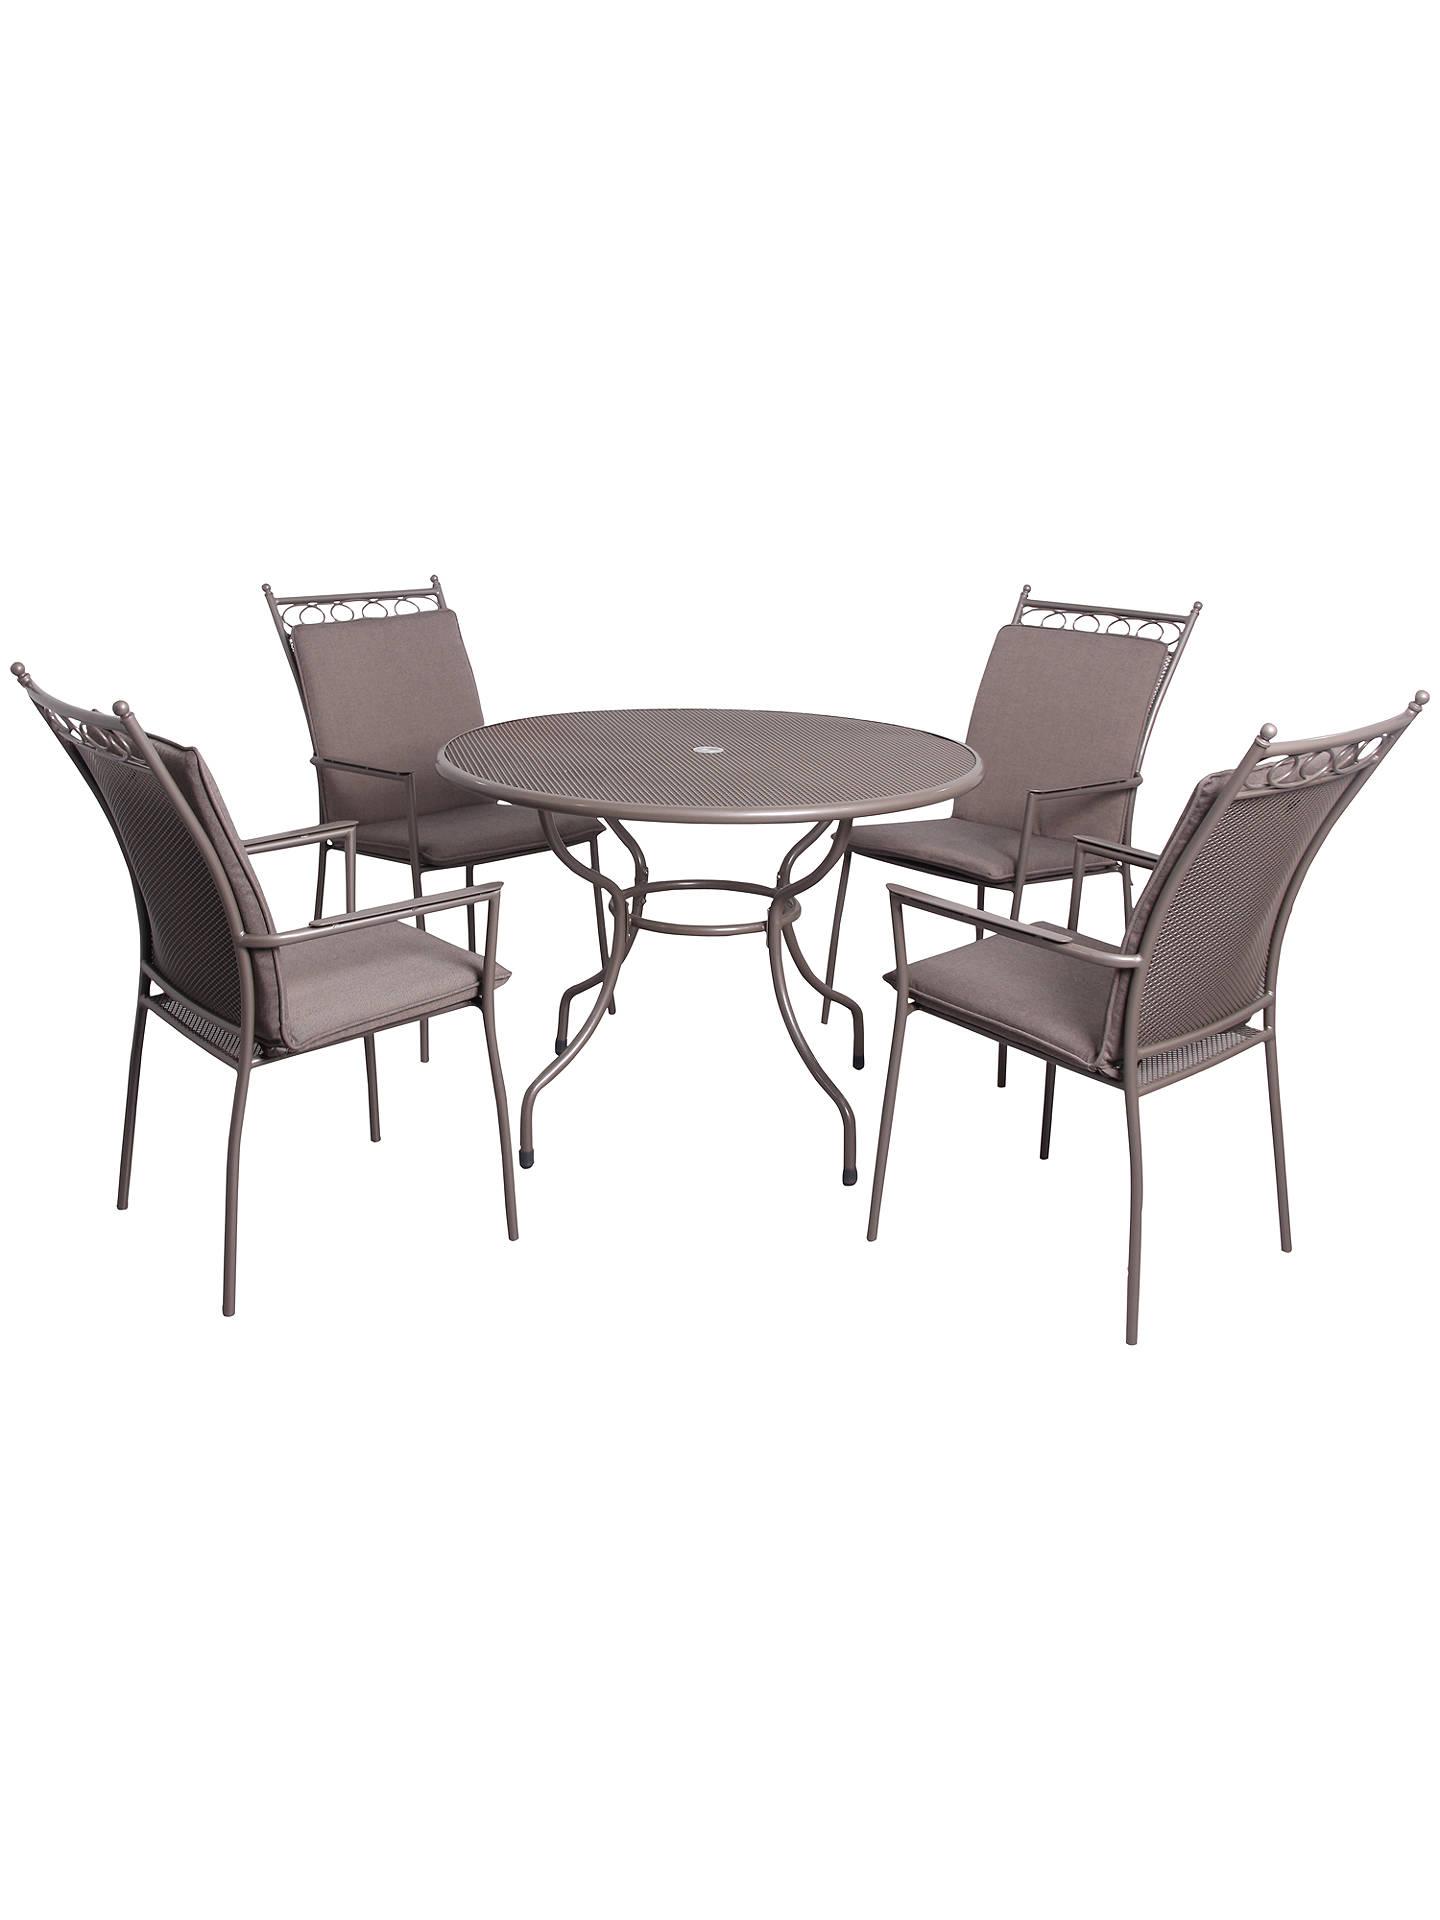 Lg Outdoor Richmond 4 Seater Highback Dining Set Online At Johnlewis